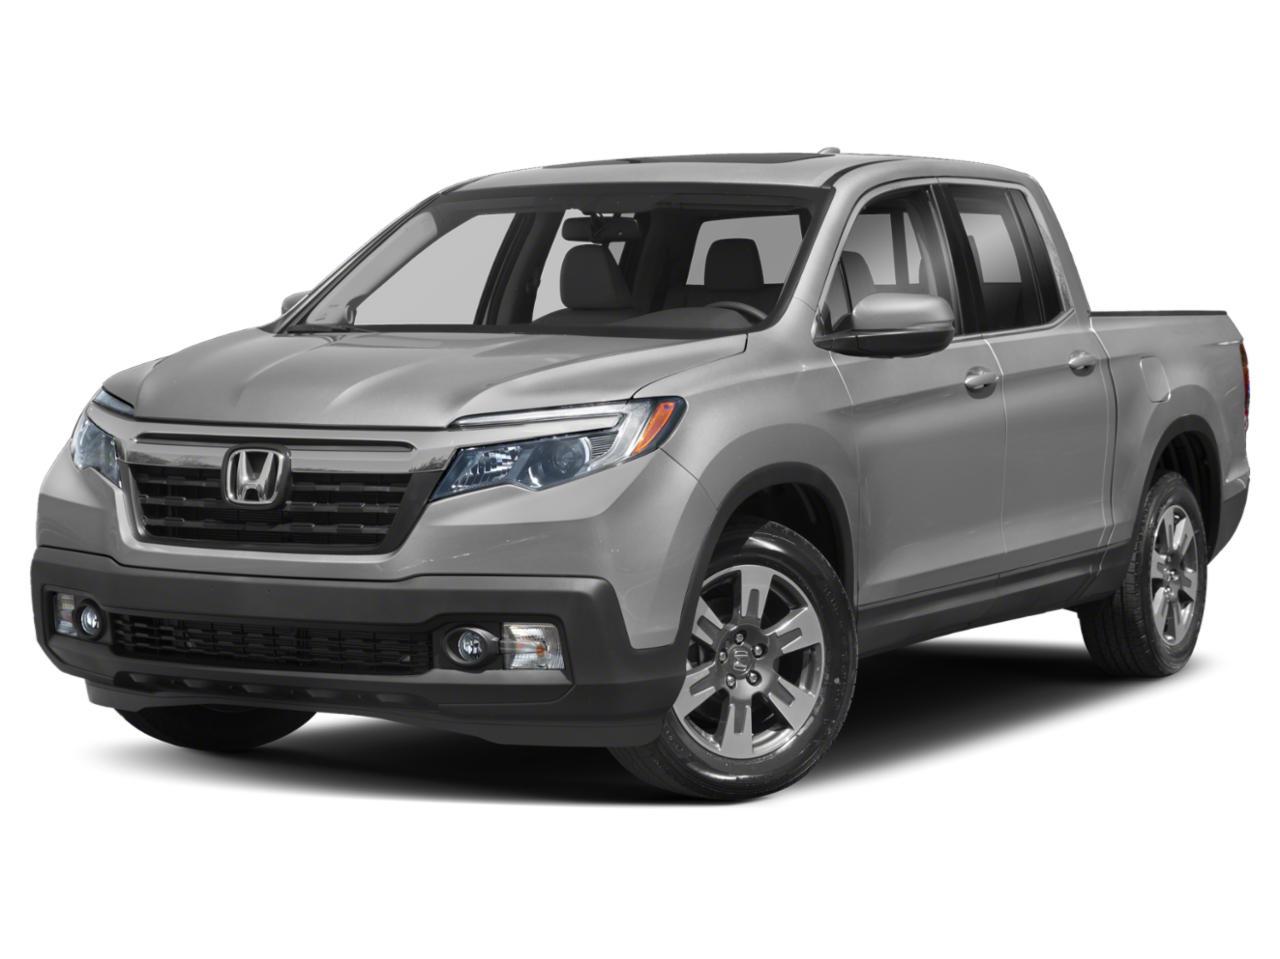 2019 Honda Ridgeline Vehicle Photo in Kingwood, TX 77339